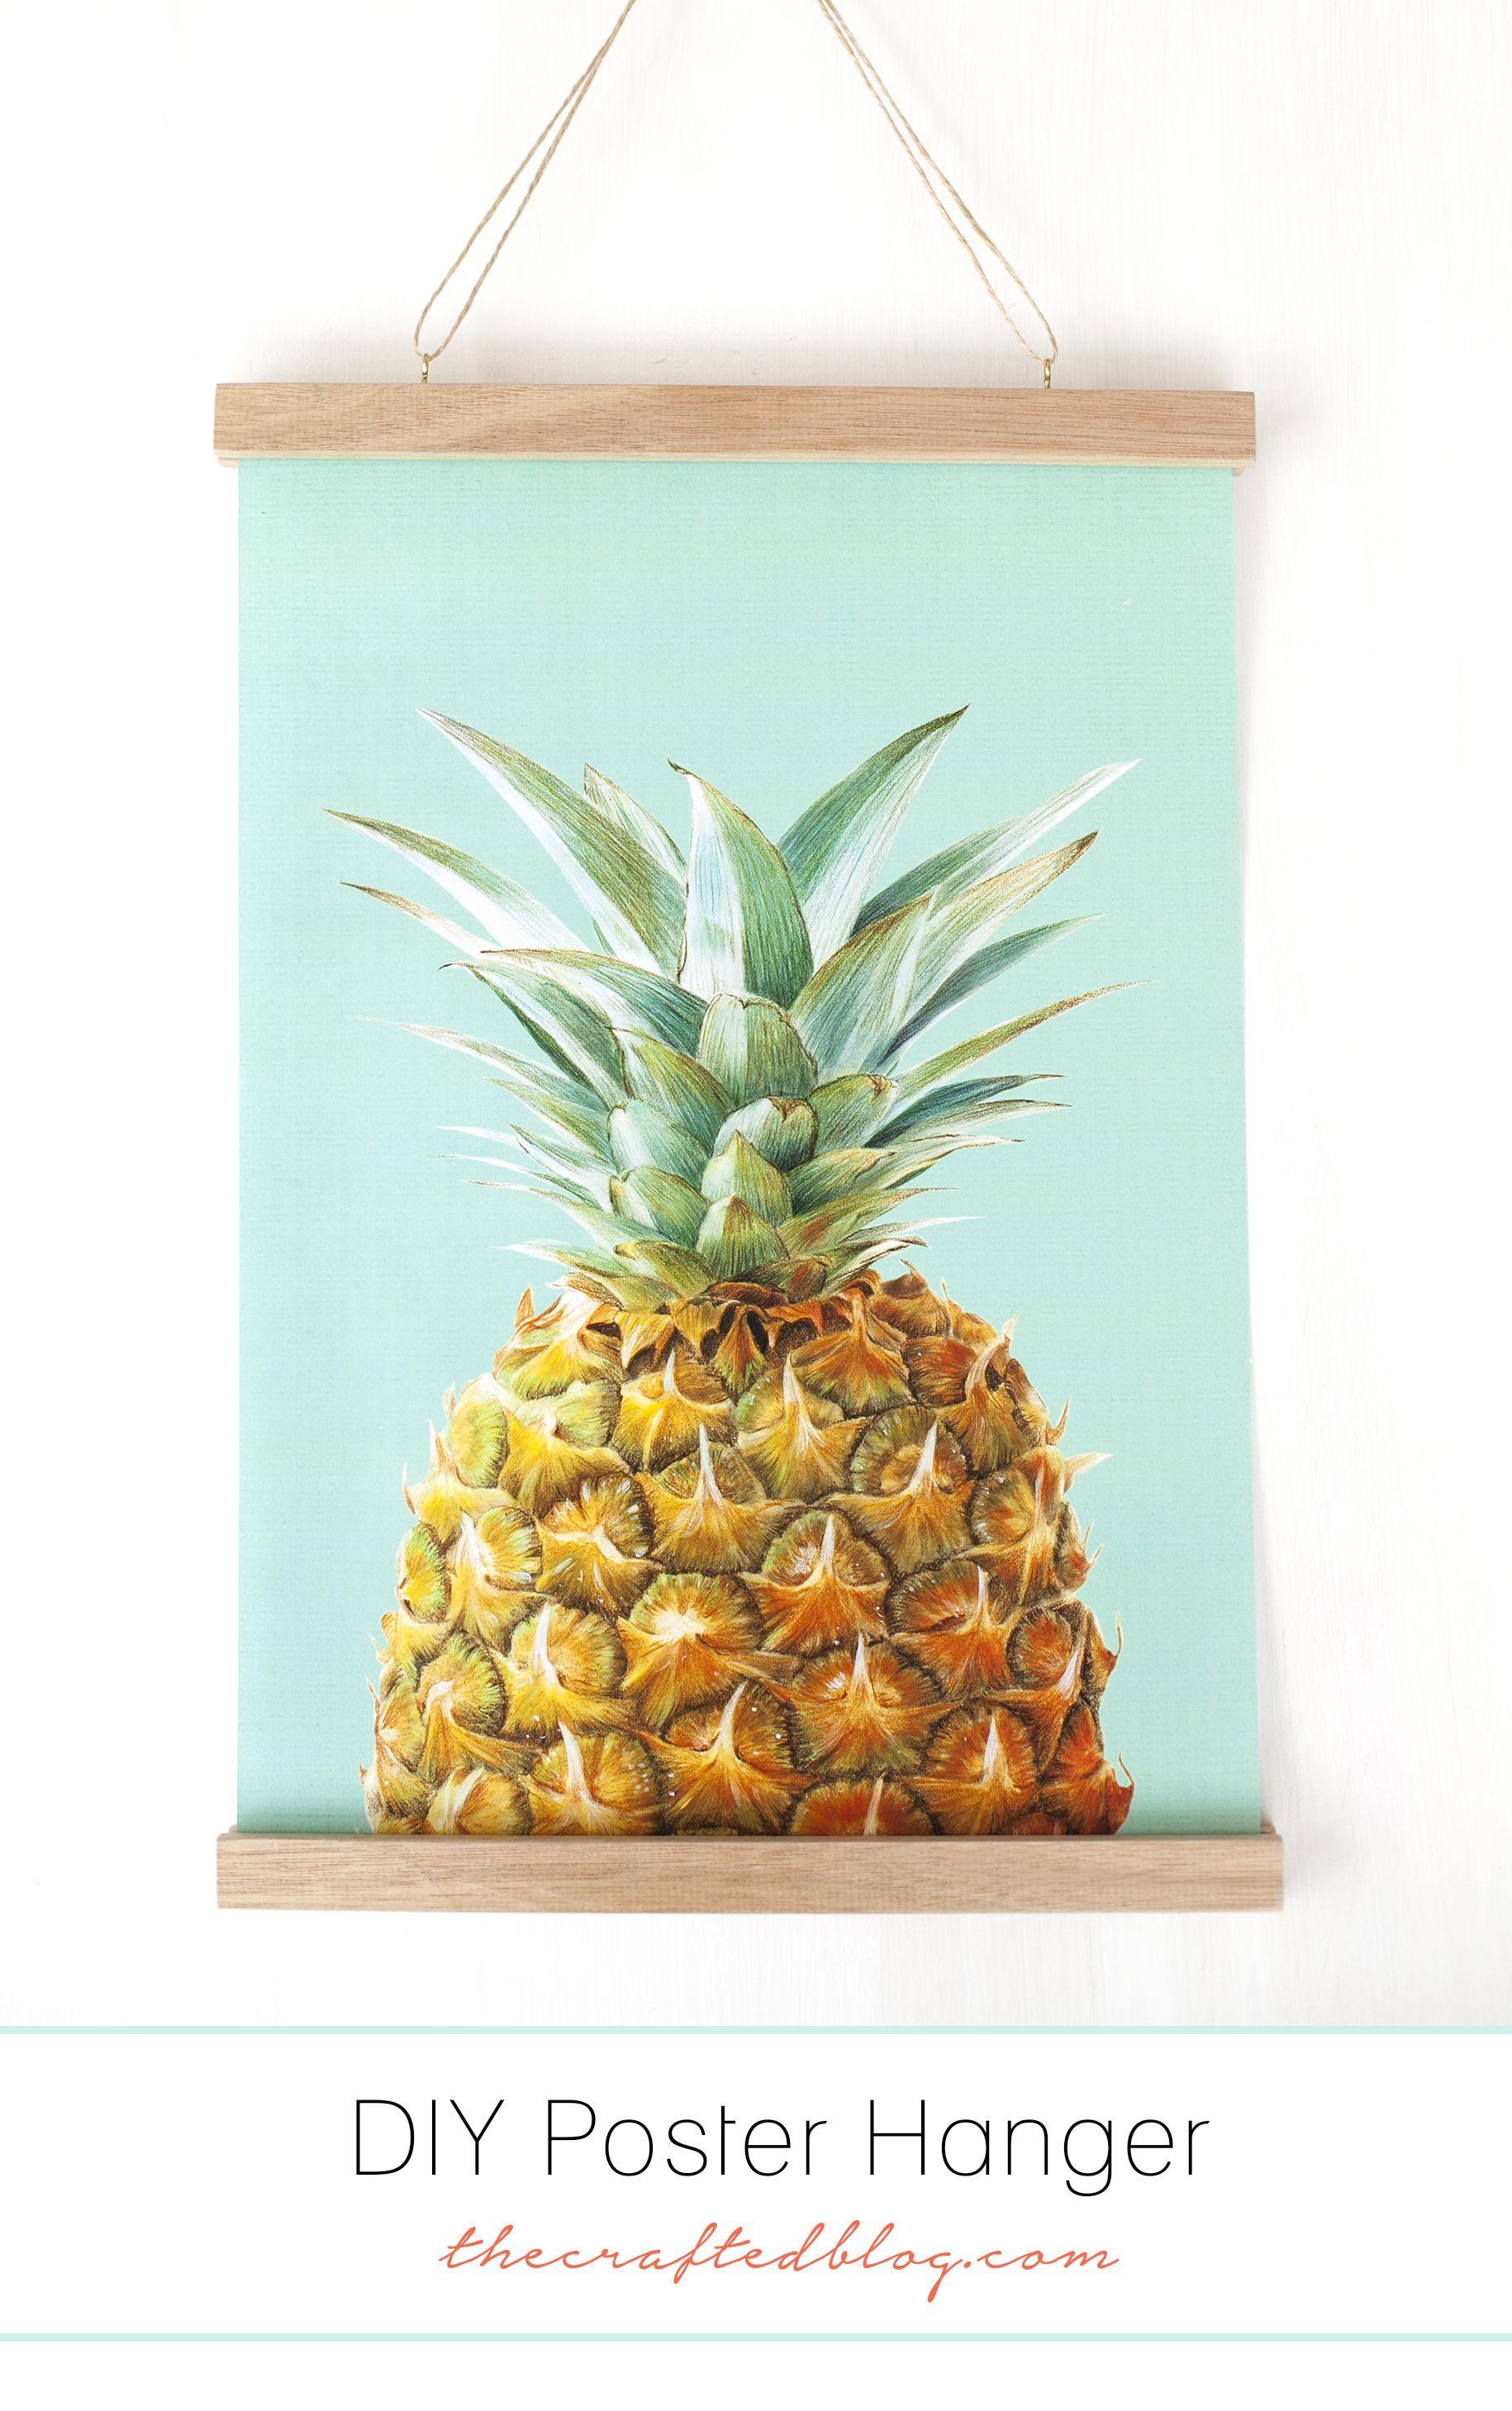 Make your own poster frames